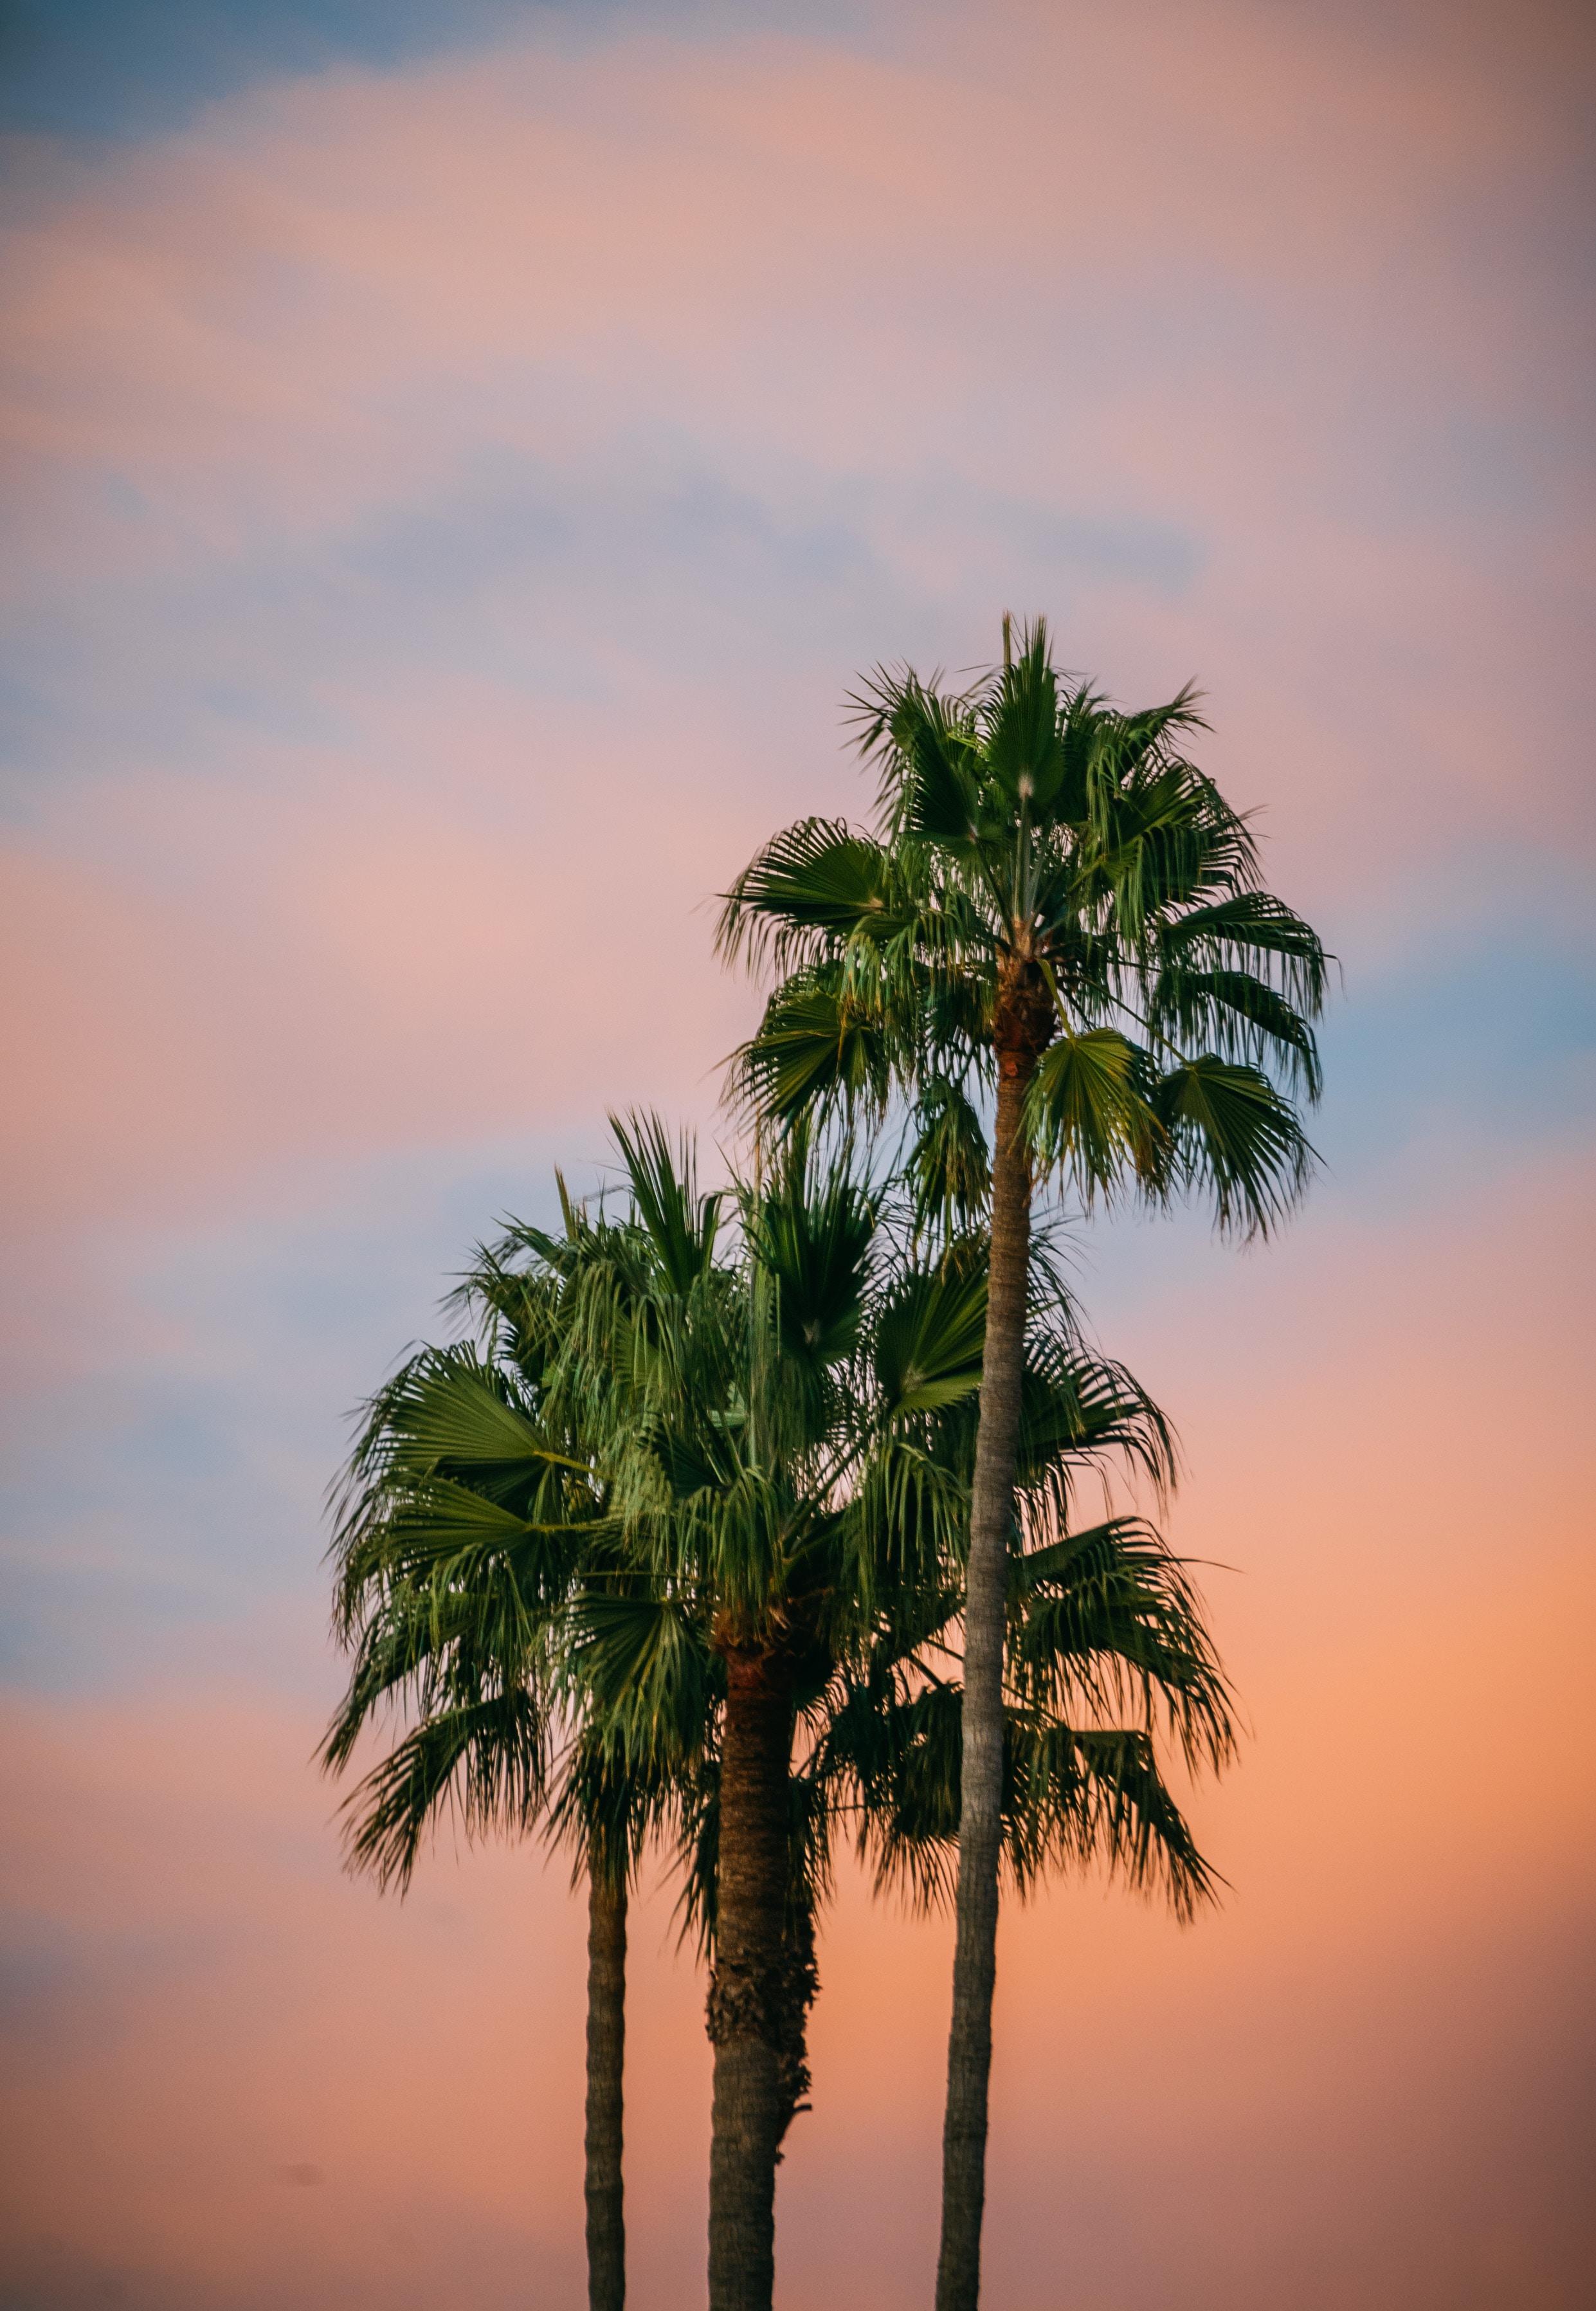 low-light photo of three fan palm trees